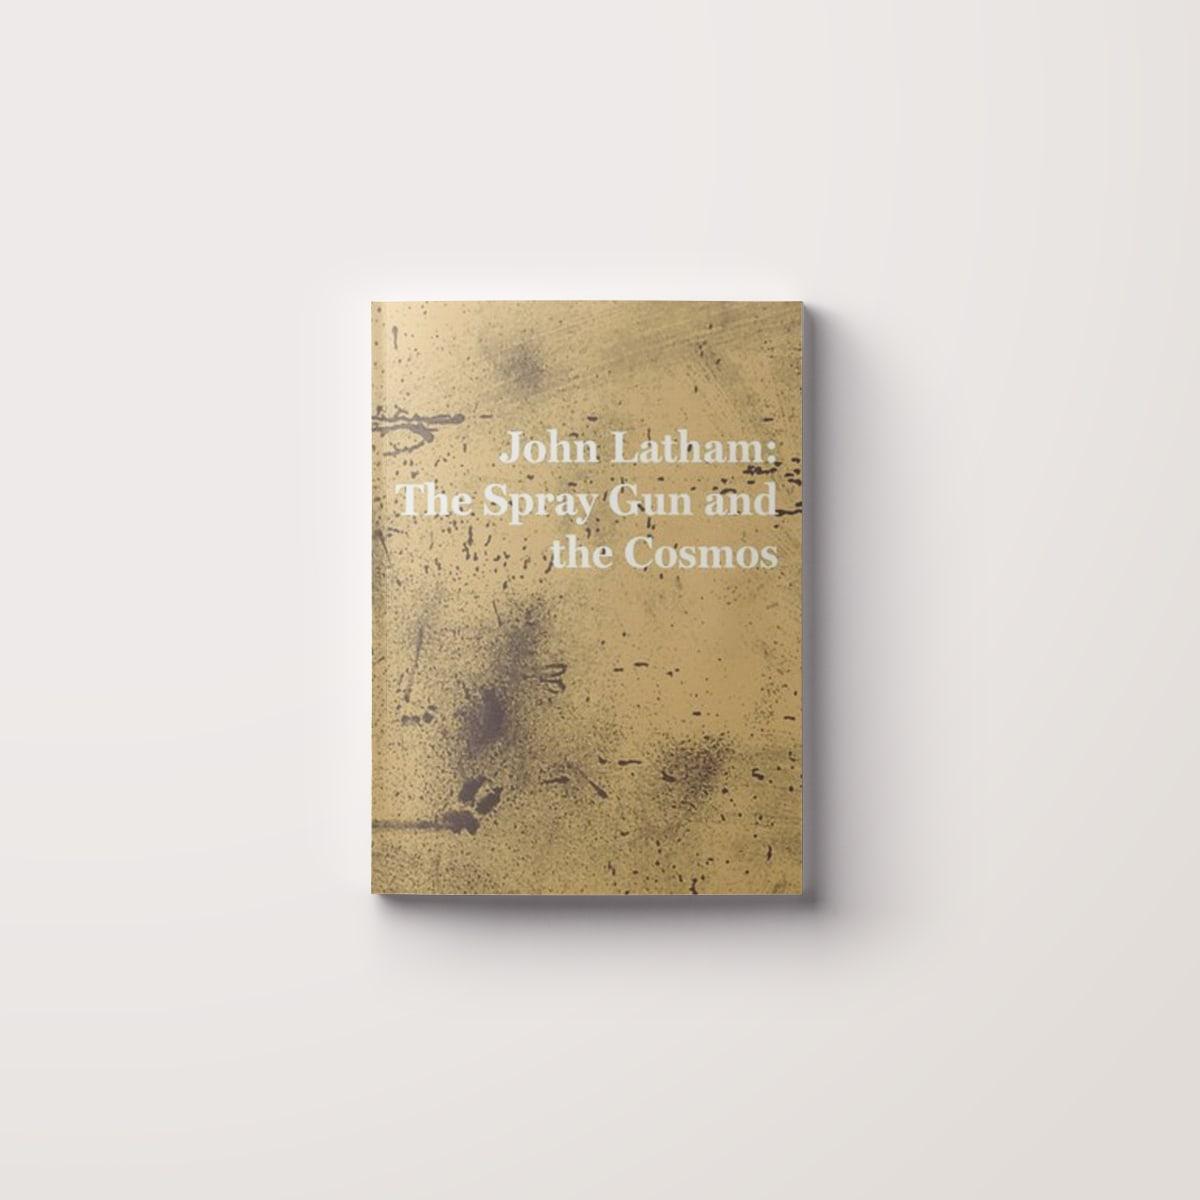 John Latham: The Spray Gun and the Cosmos